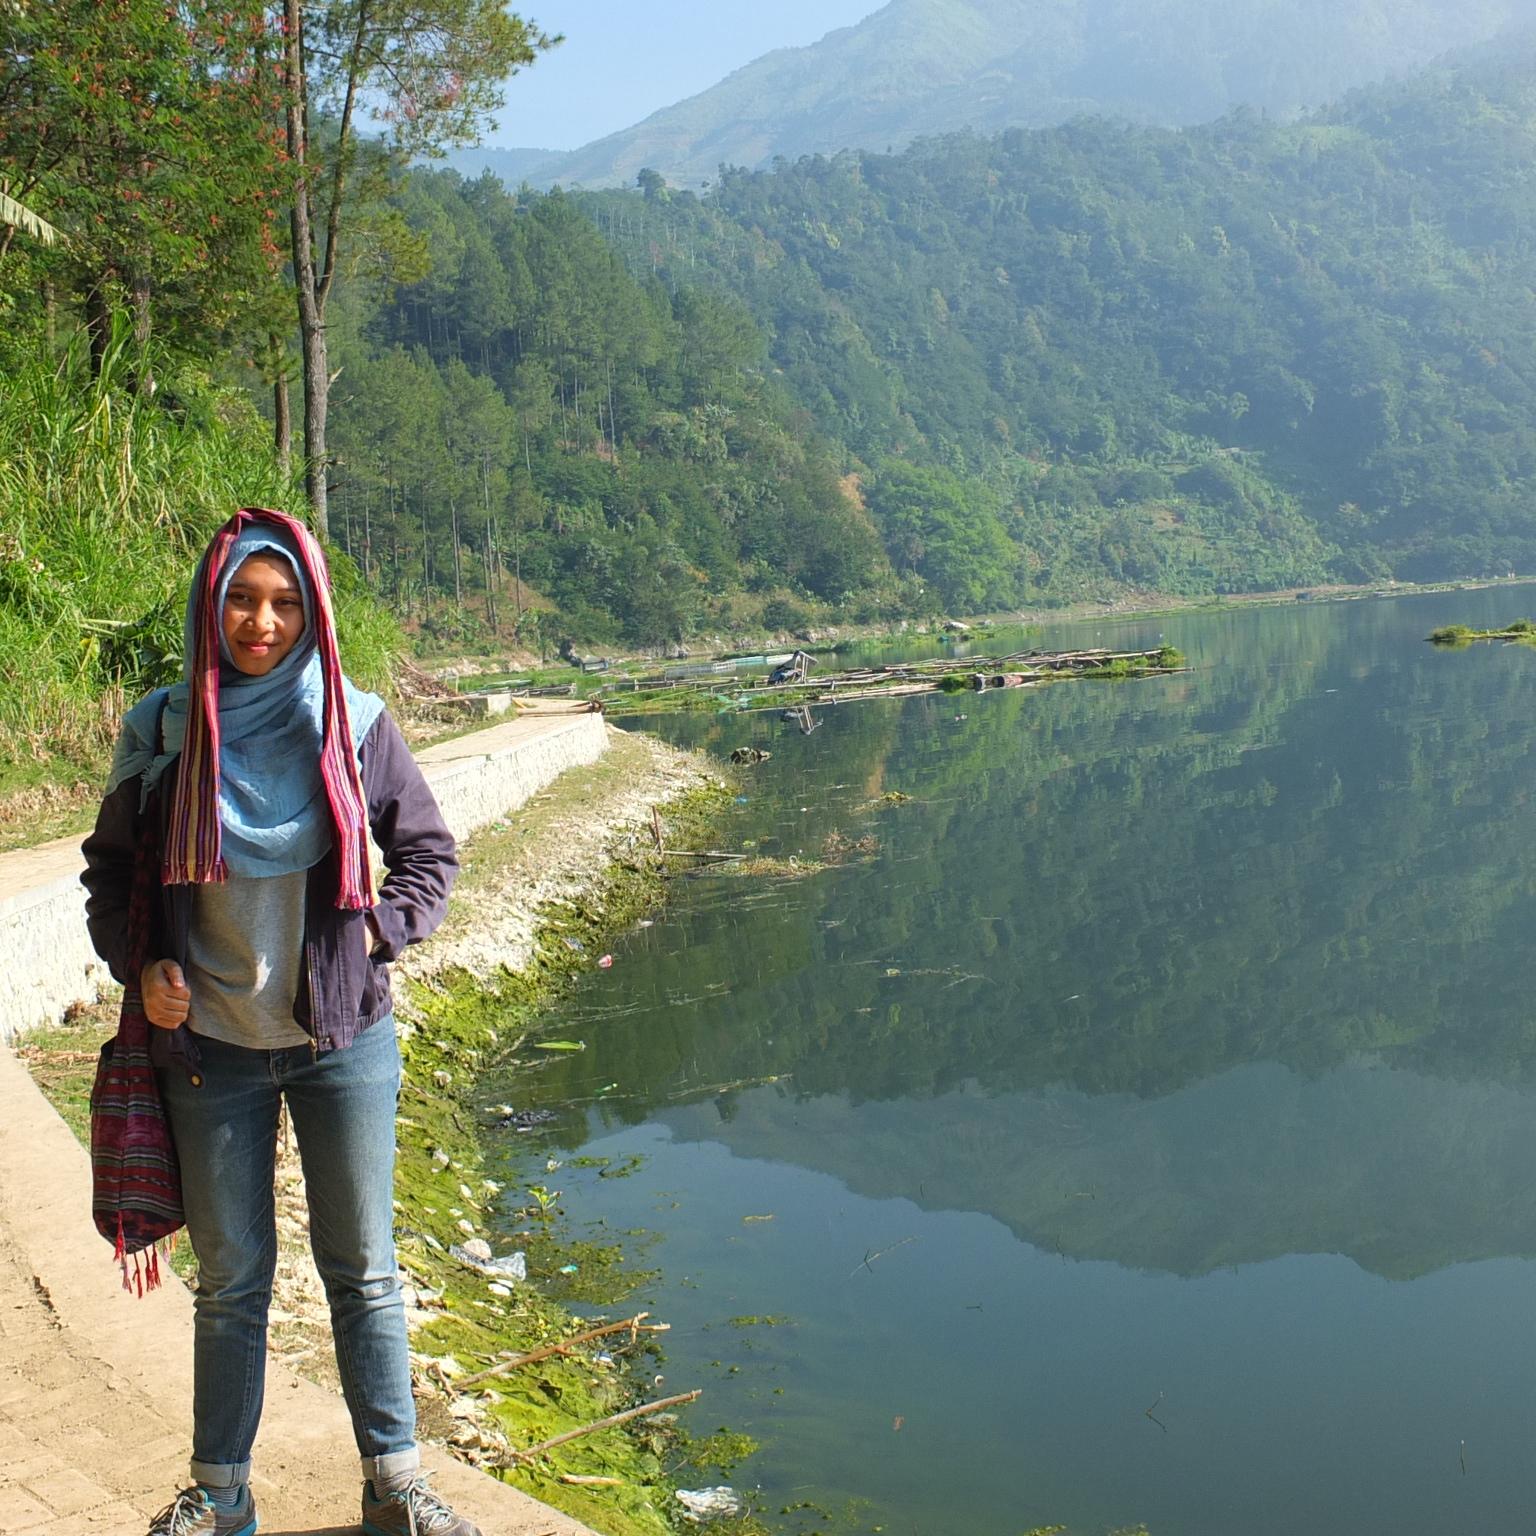 Mendaki Bukit Seroja Dscf1489 Puncak Kab Wonosobo